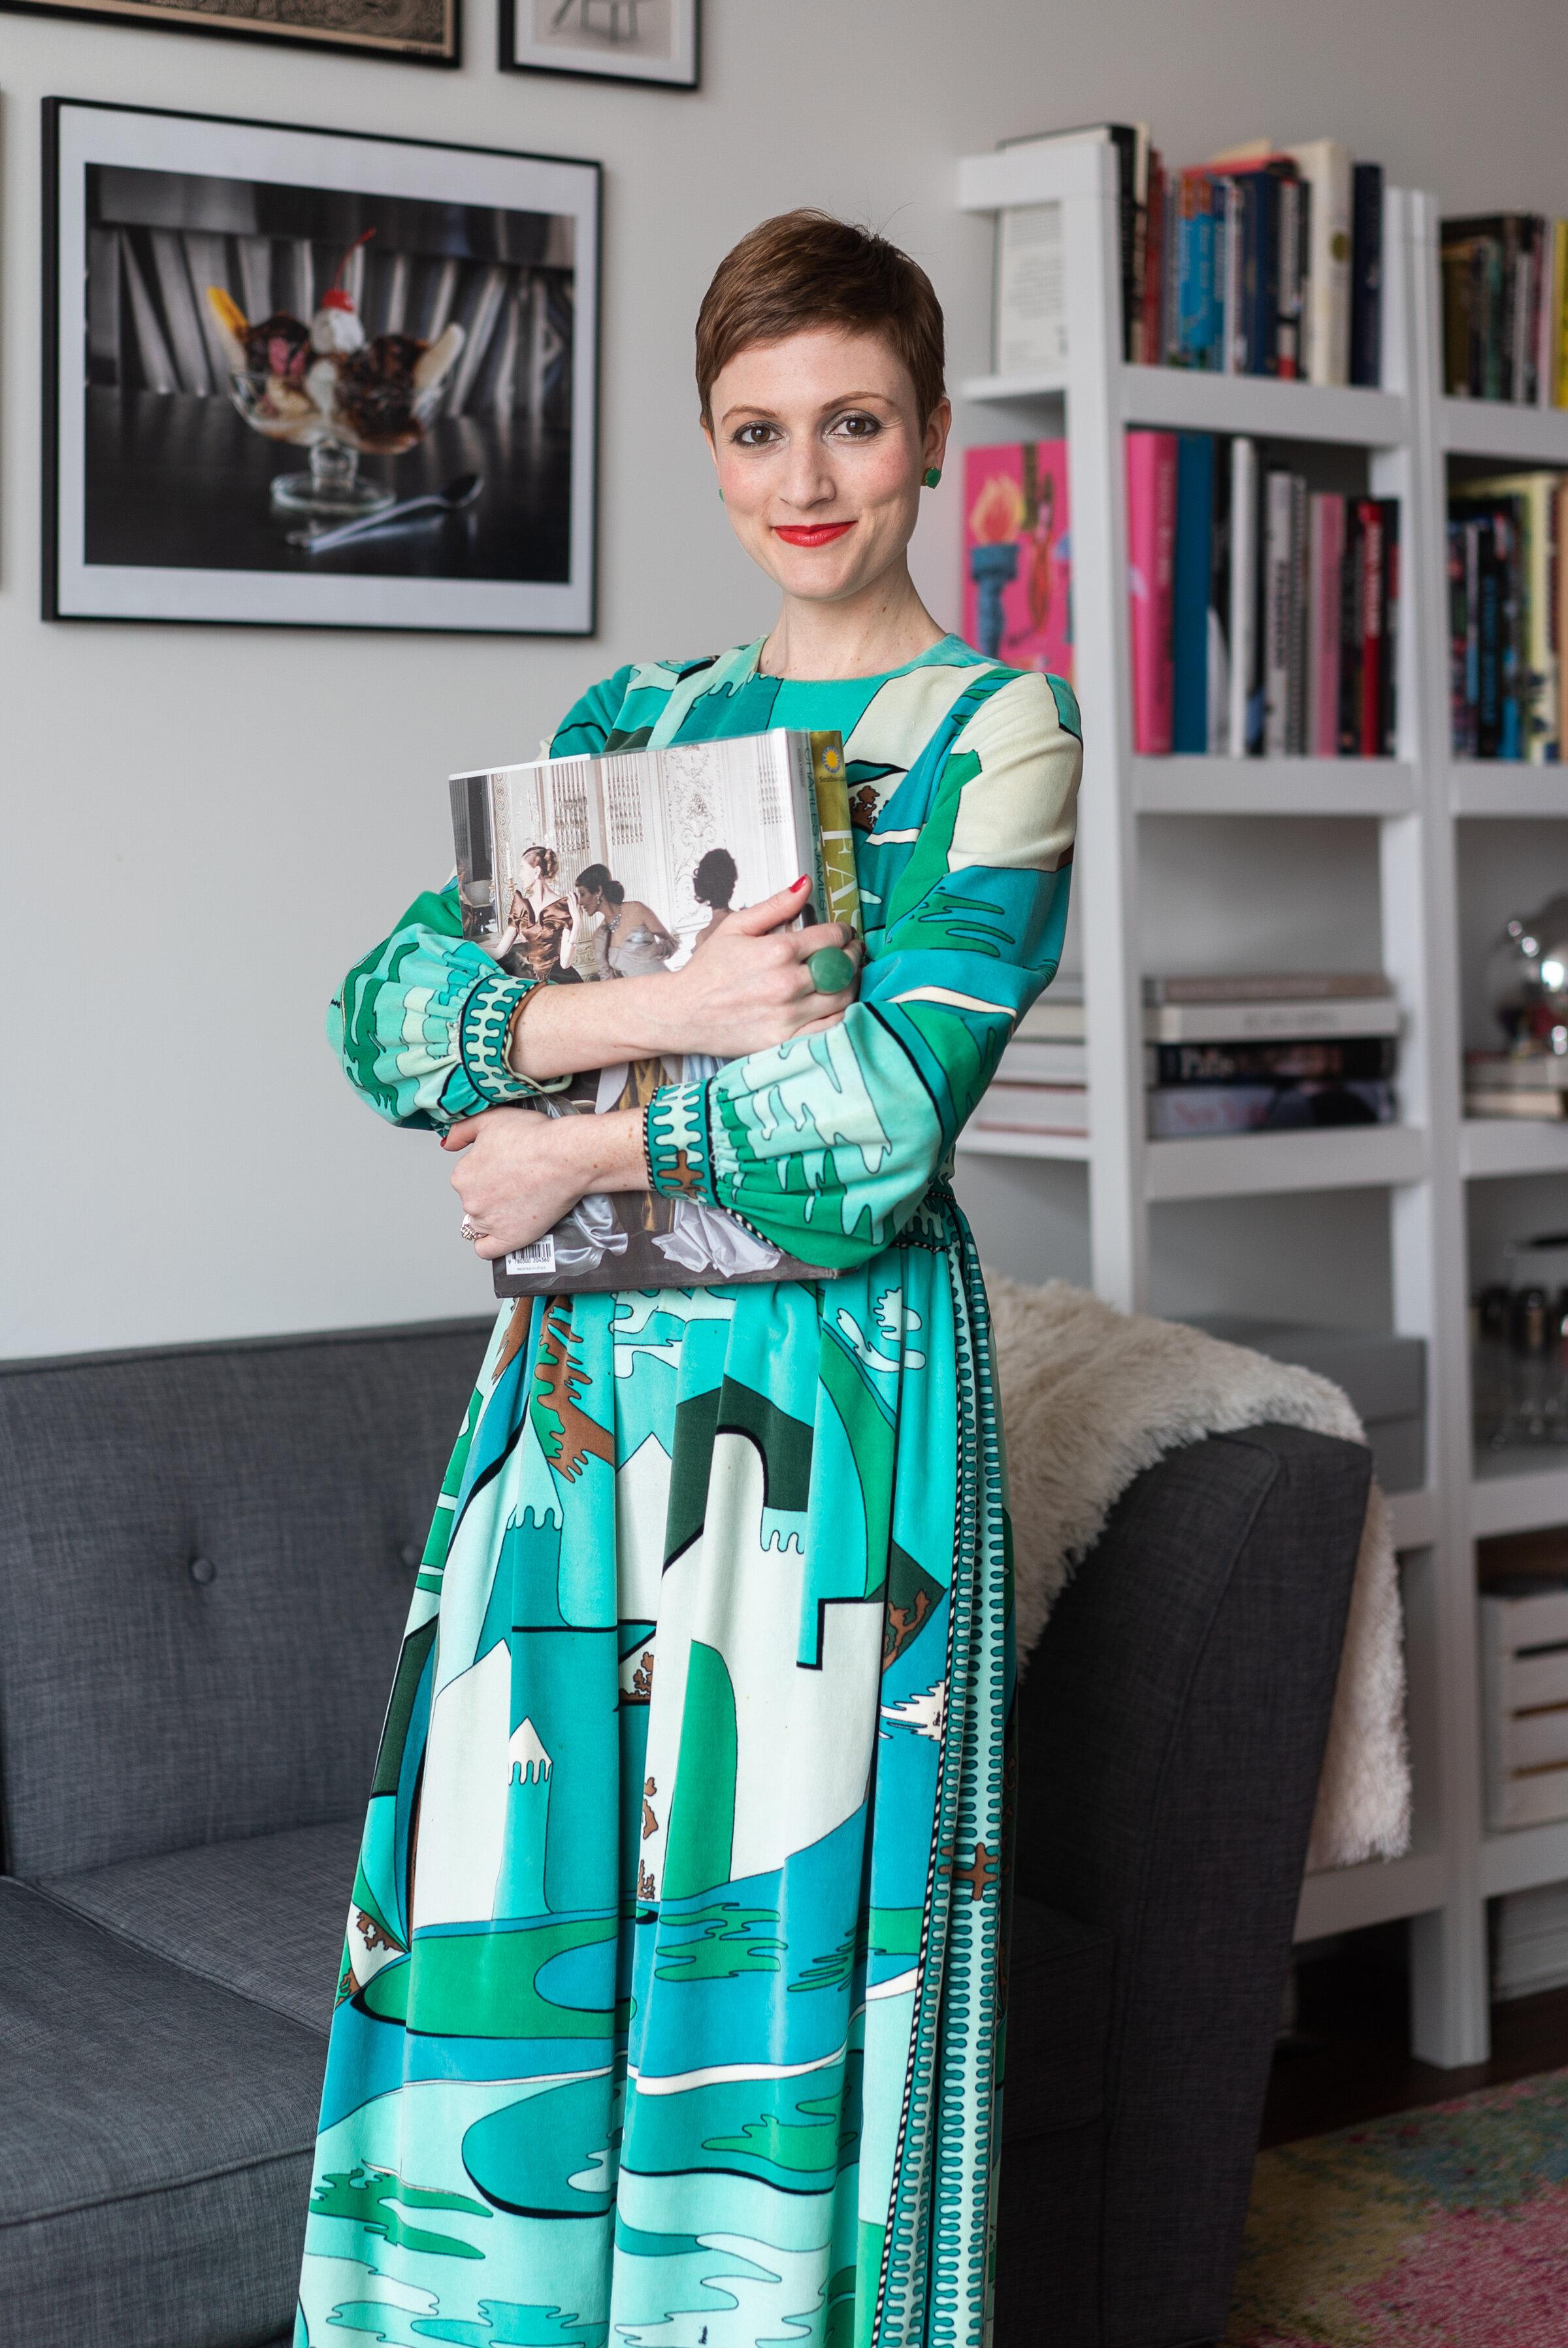 Photo by Liisa Jokinen for Gem Stories